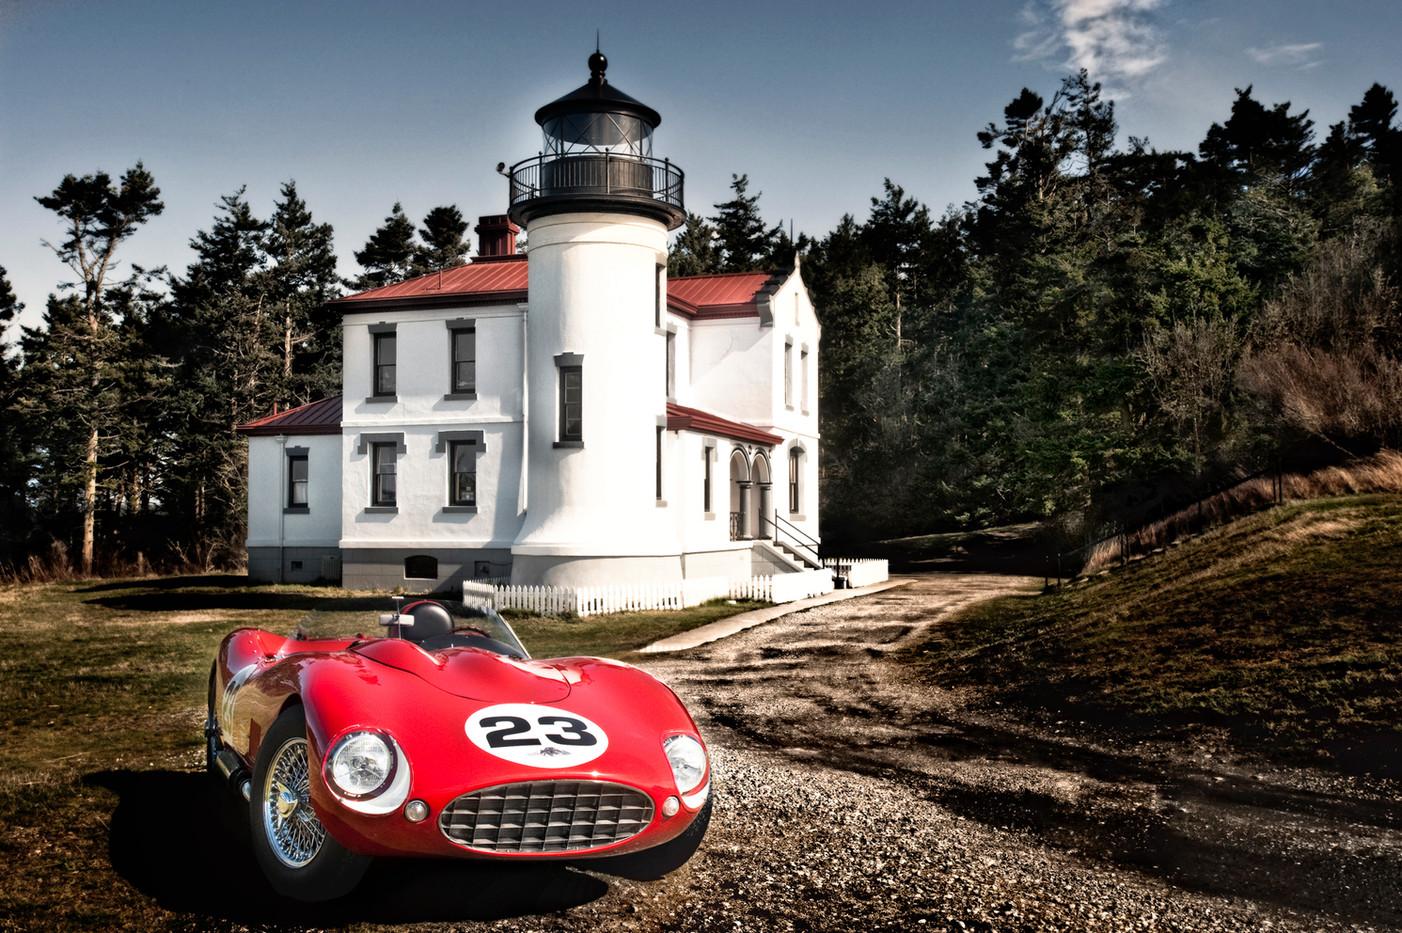 morgan_vintage cars_photography 11.jpg